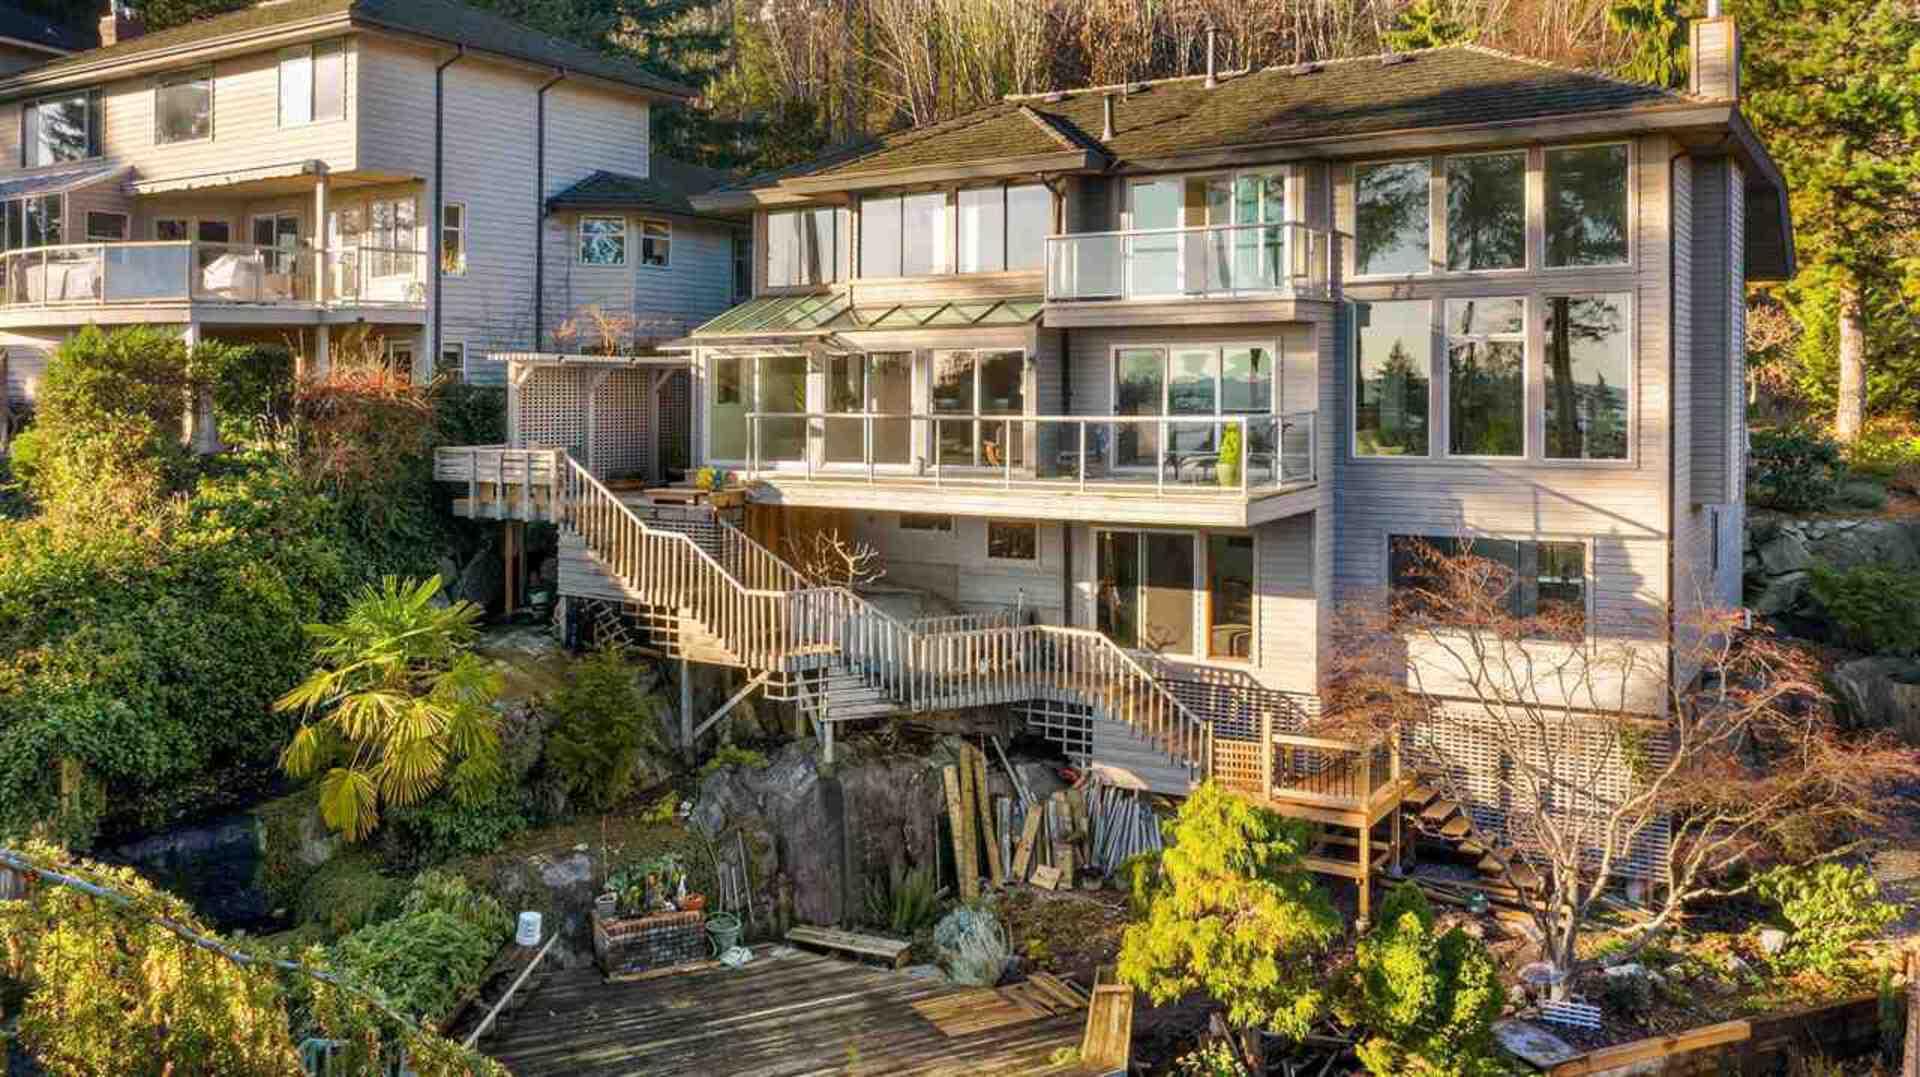 4864-vista-place-caulfeild-west-vancouver-20 at 4864 Vista Place, Caulfeild, West Vancouver